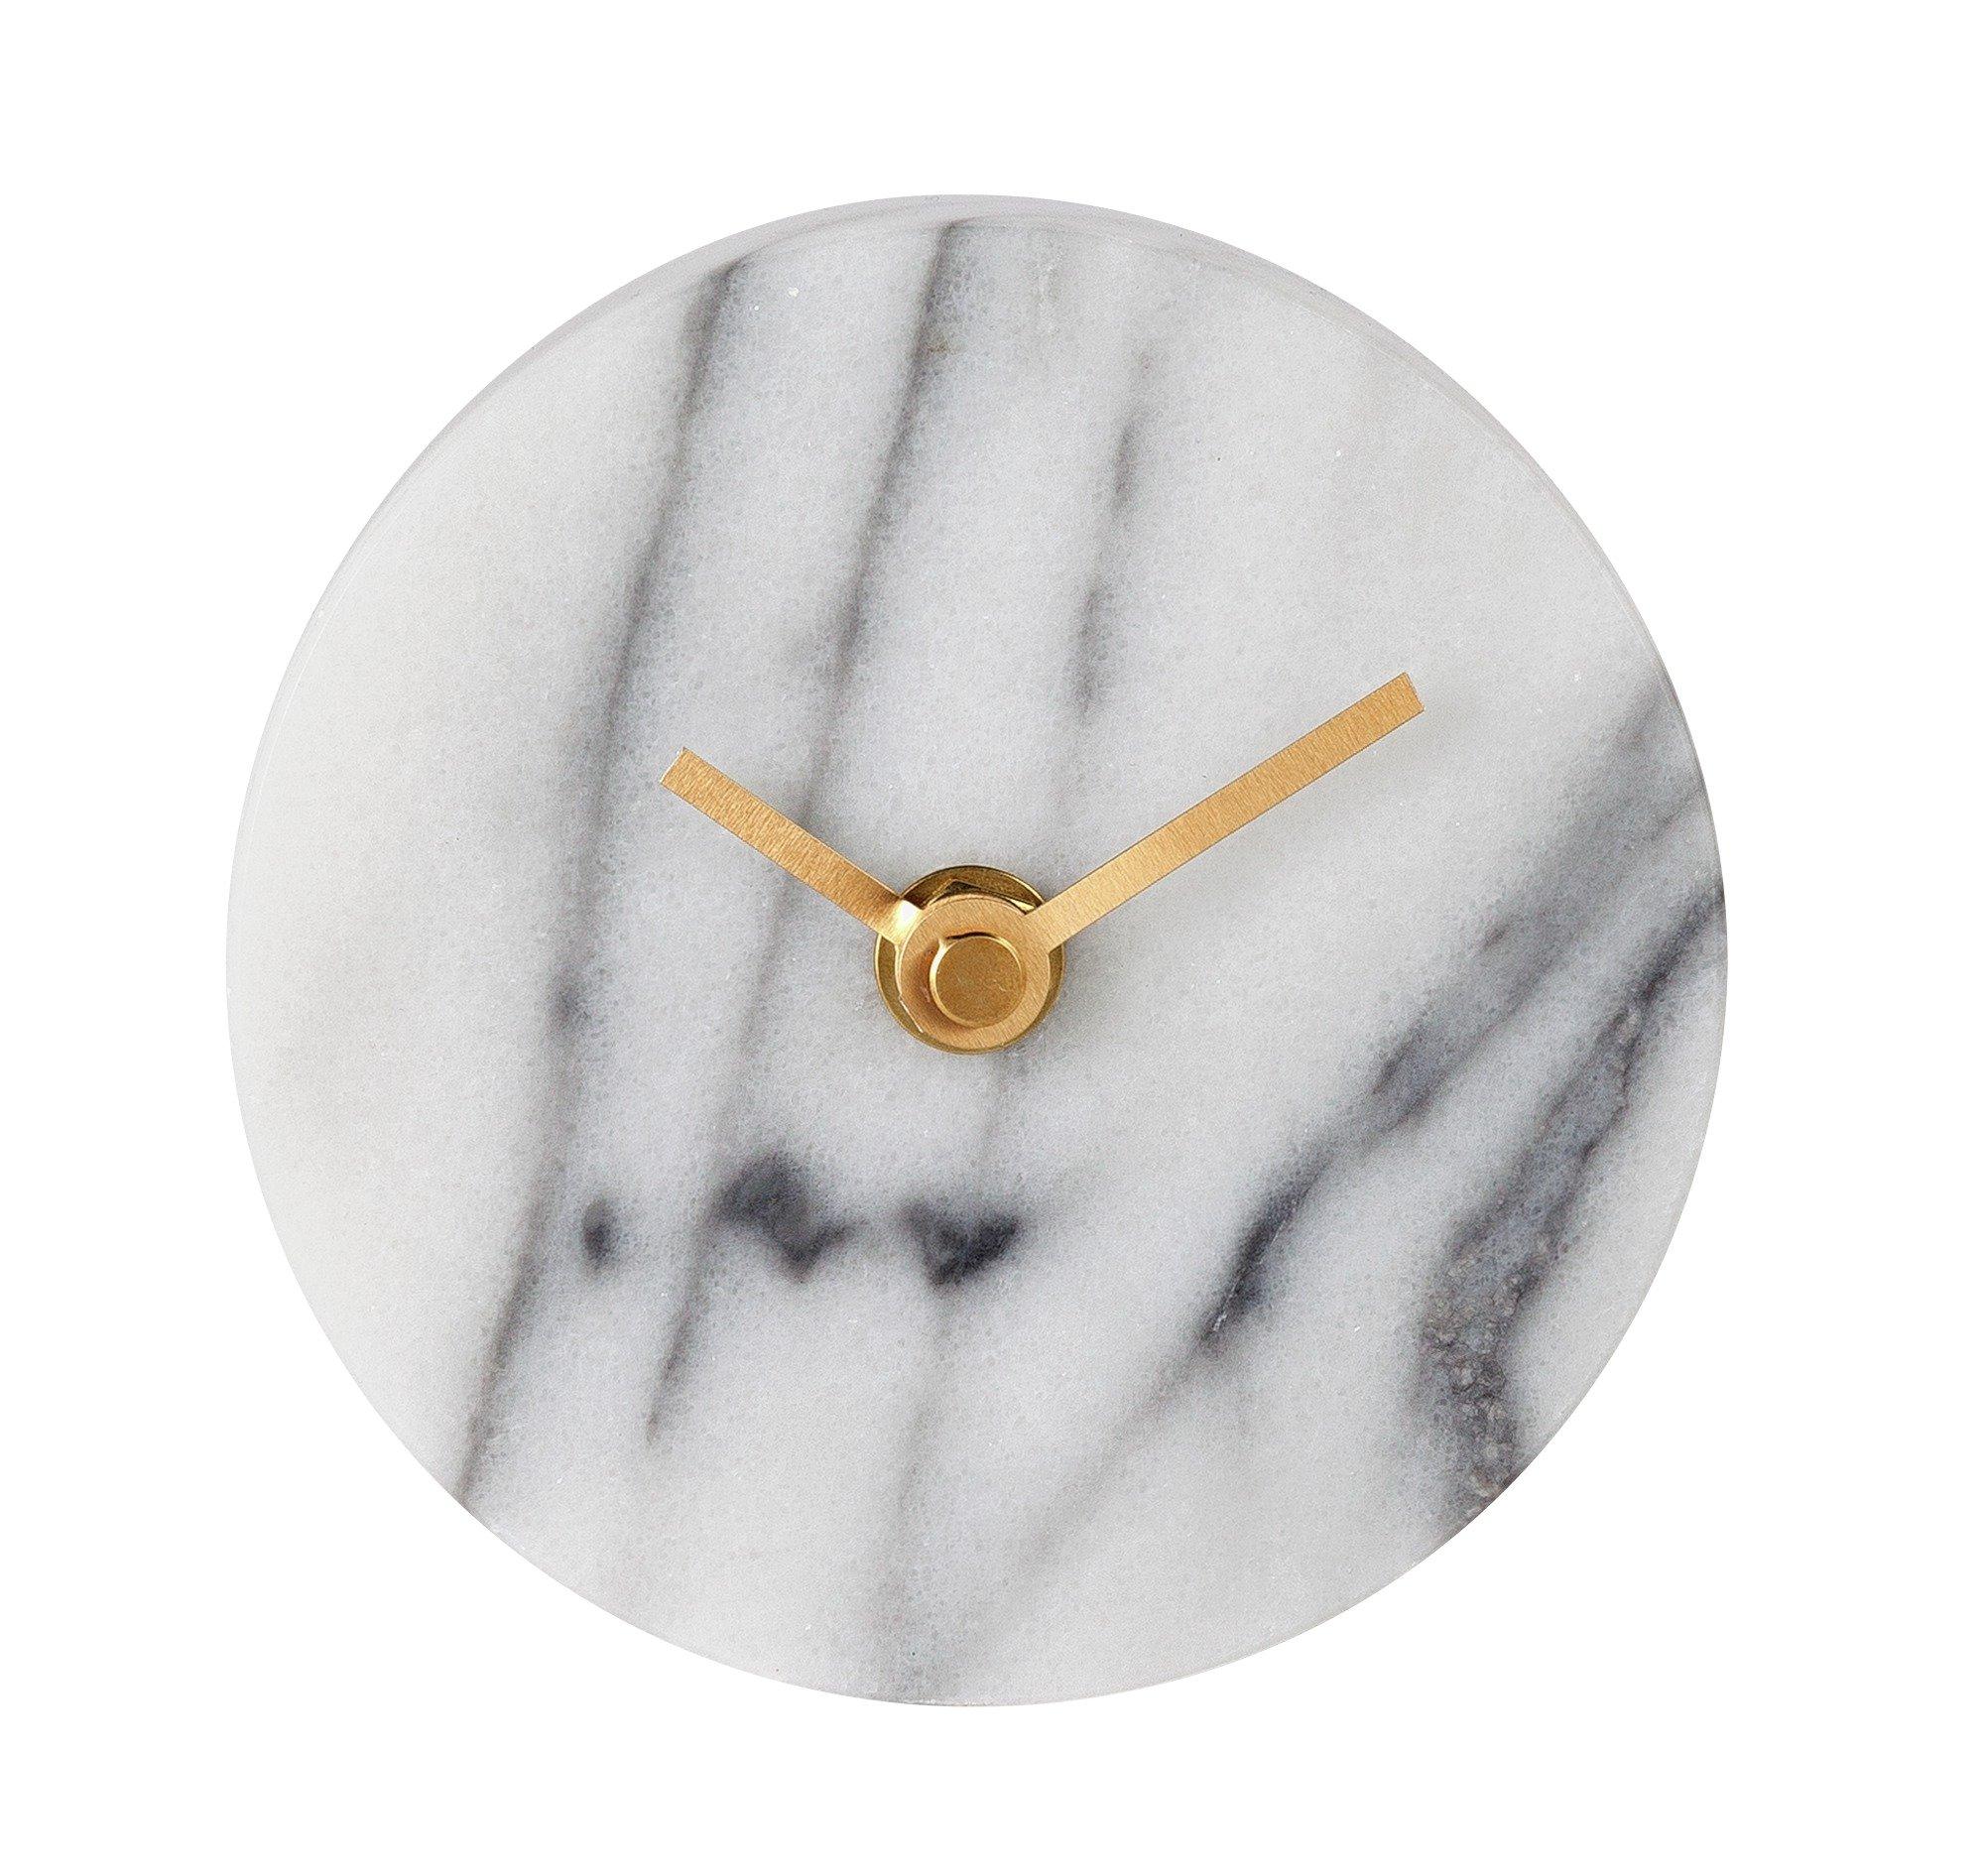 heart-of-house-rosemary-marble-mantel-clock